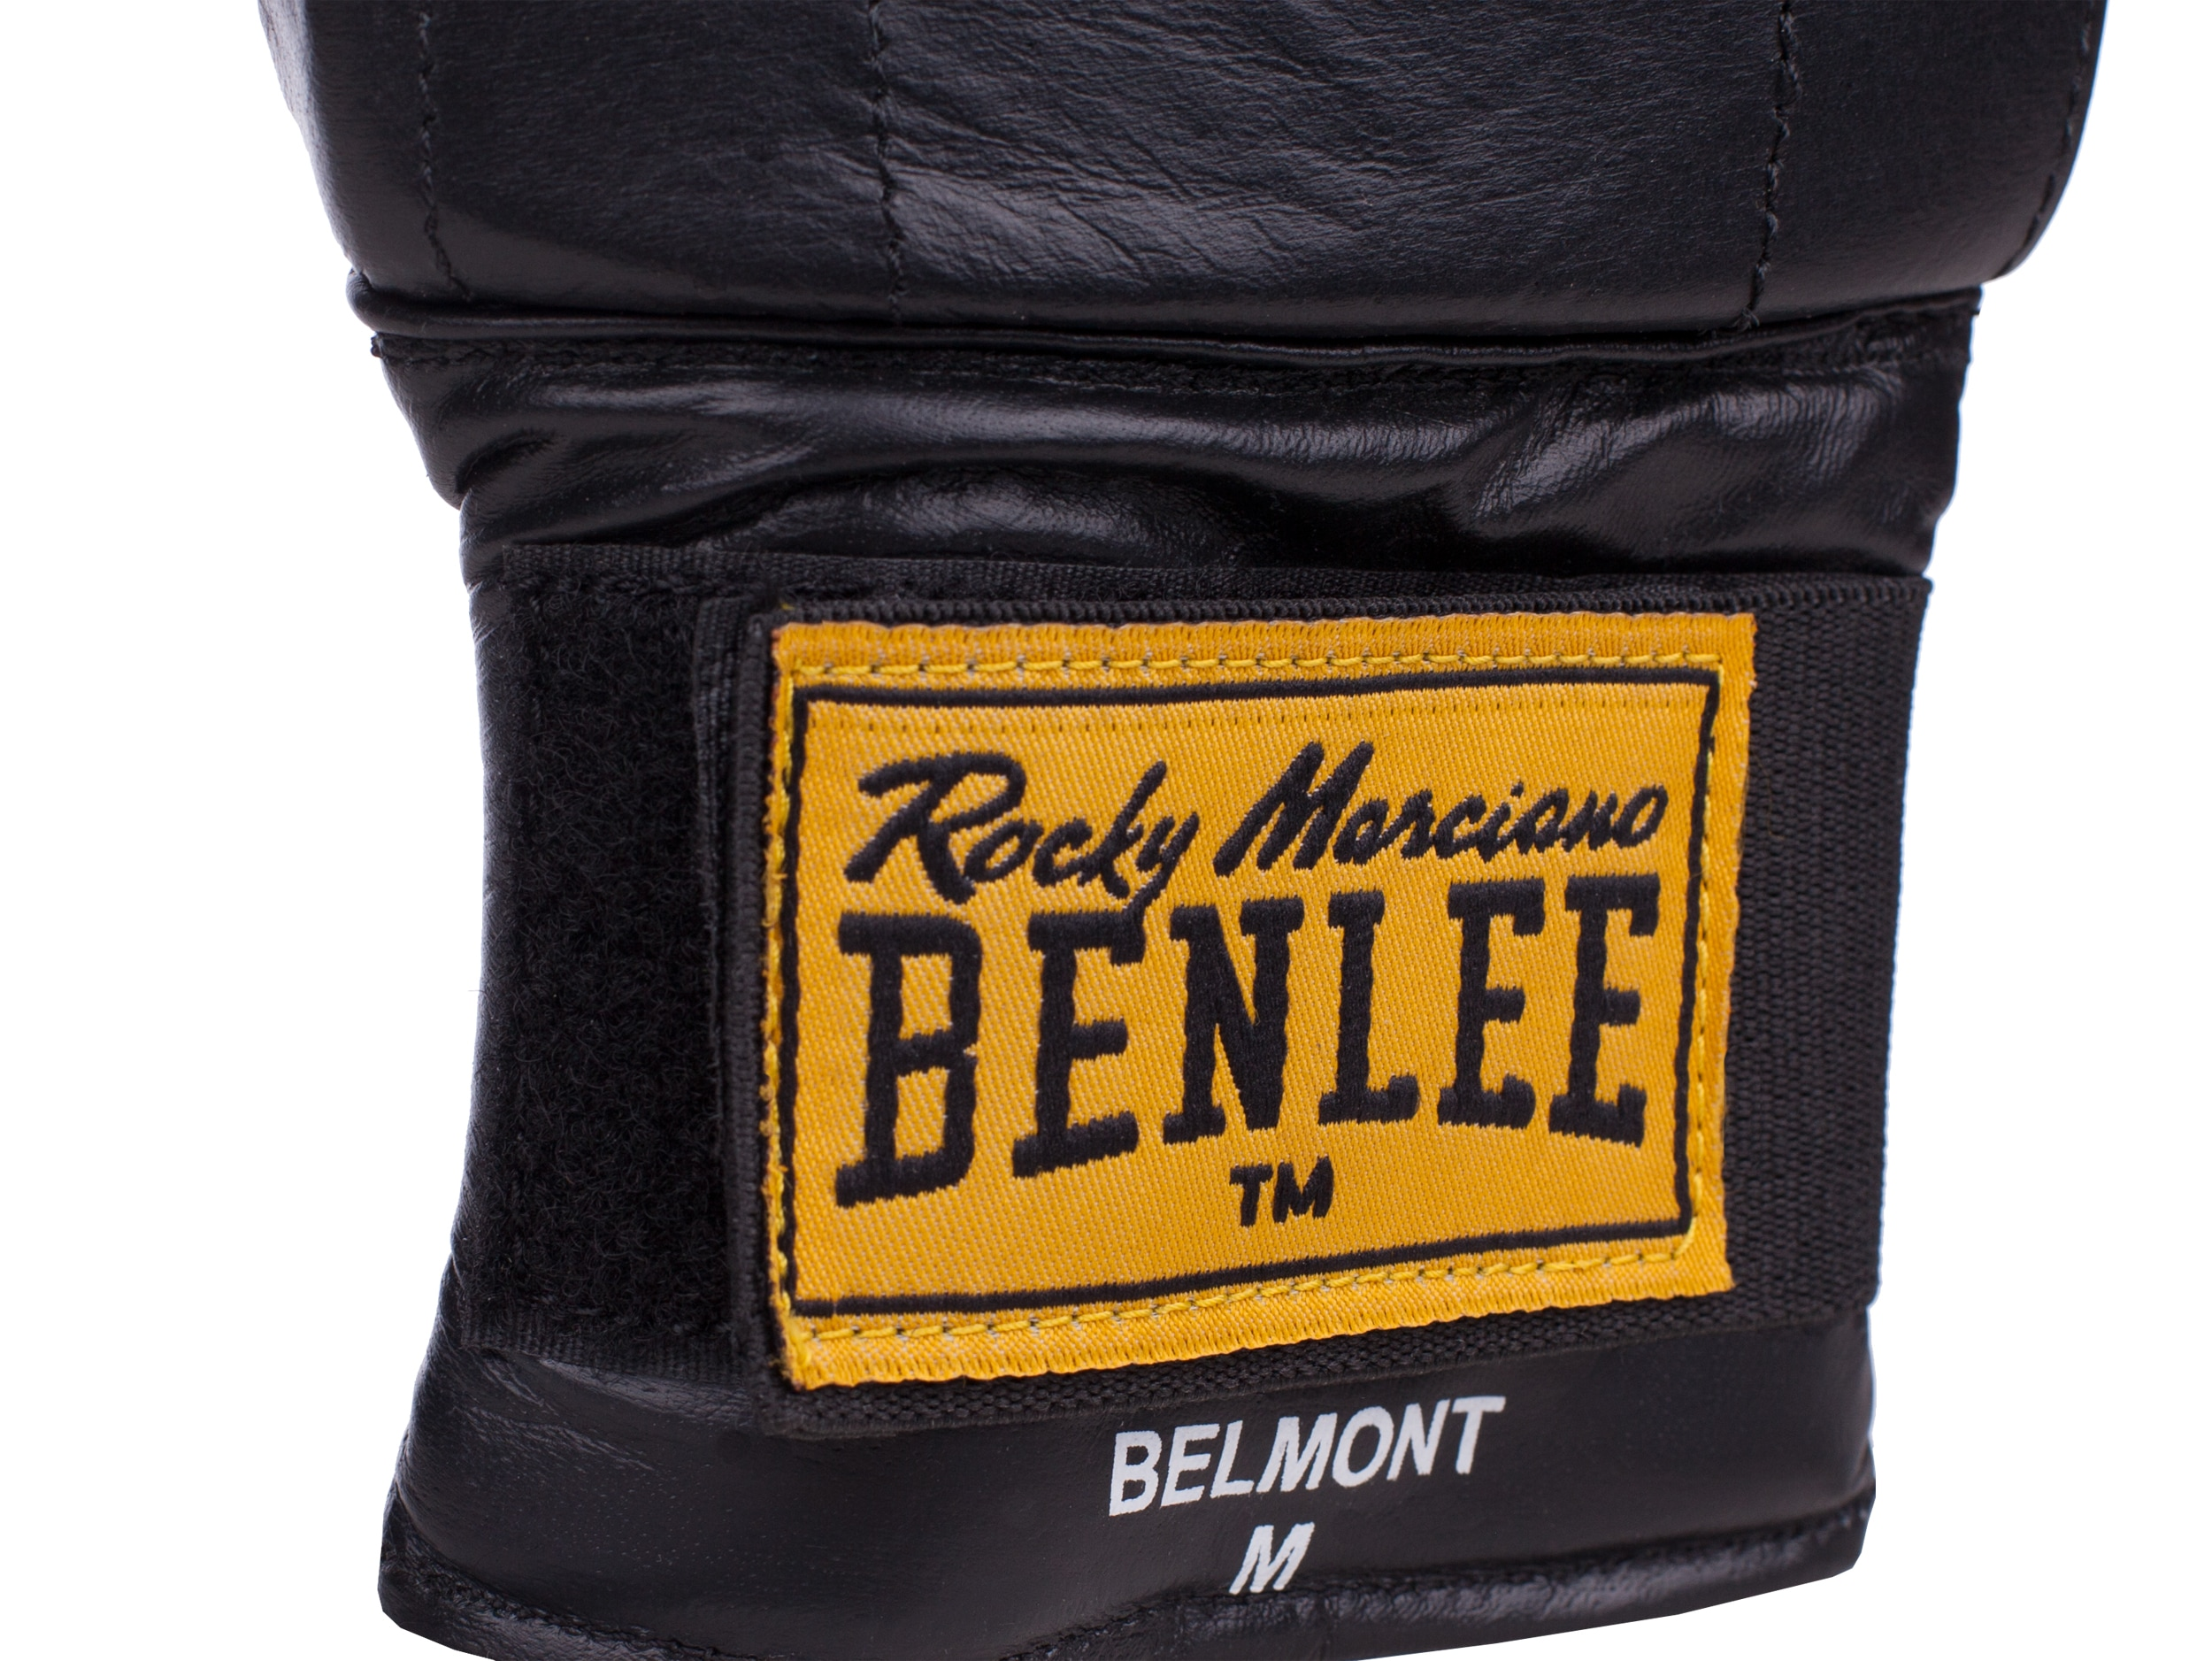 Benlee Rocky Marciano Boxhandschuhe mit Klettband BELMOND | Accessoires > Handschuhe > Sonstige Handschuhe | Benlee Rocky Marciano